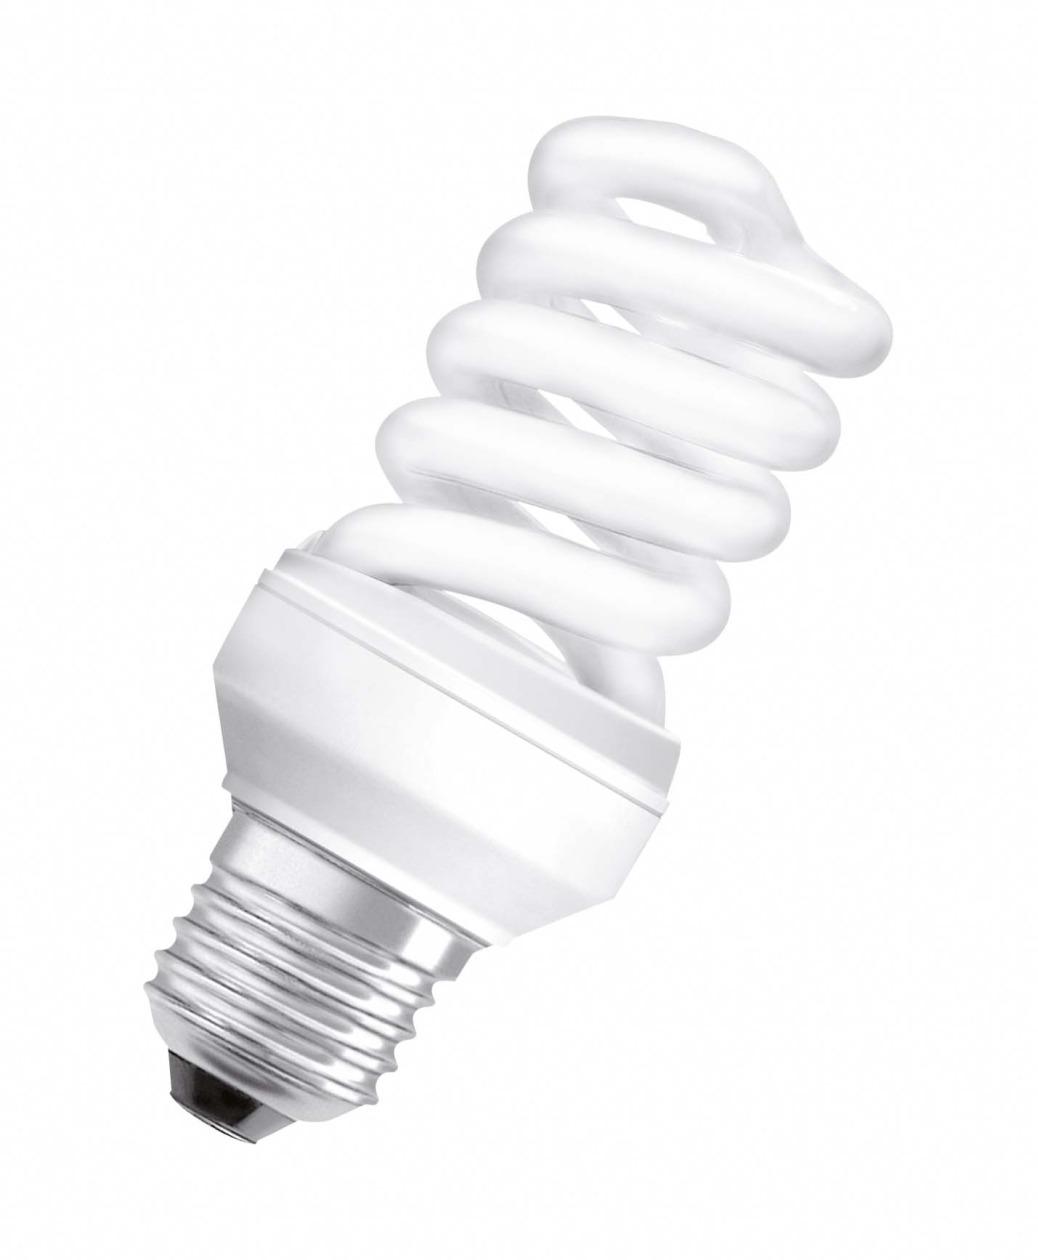 Dulux Intelligent® HE Micro Twist Λάμπα Οικονομίας Osram